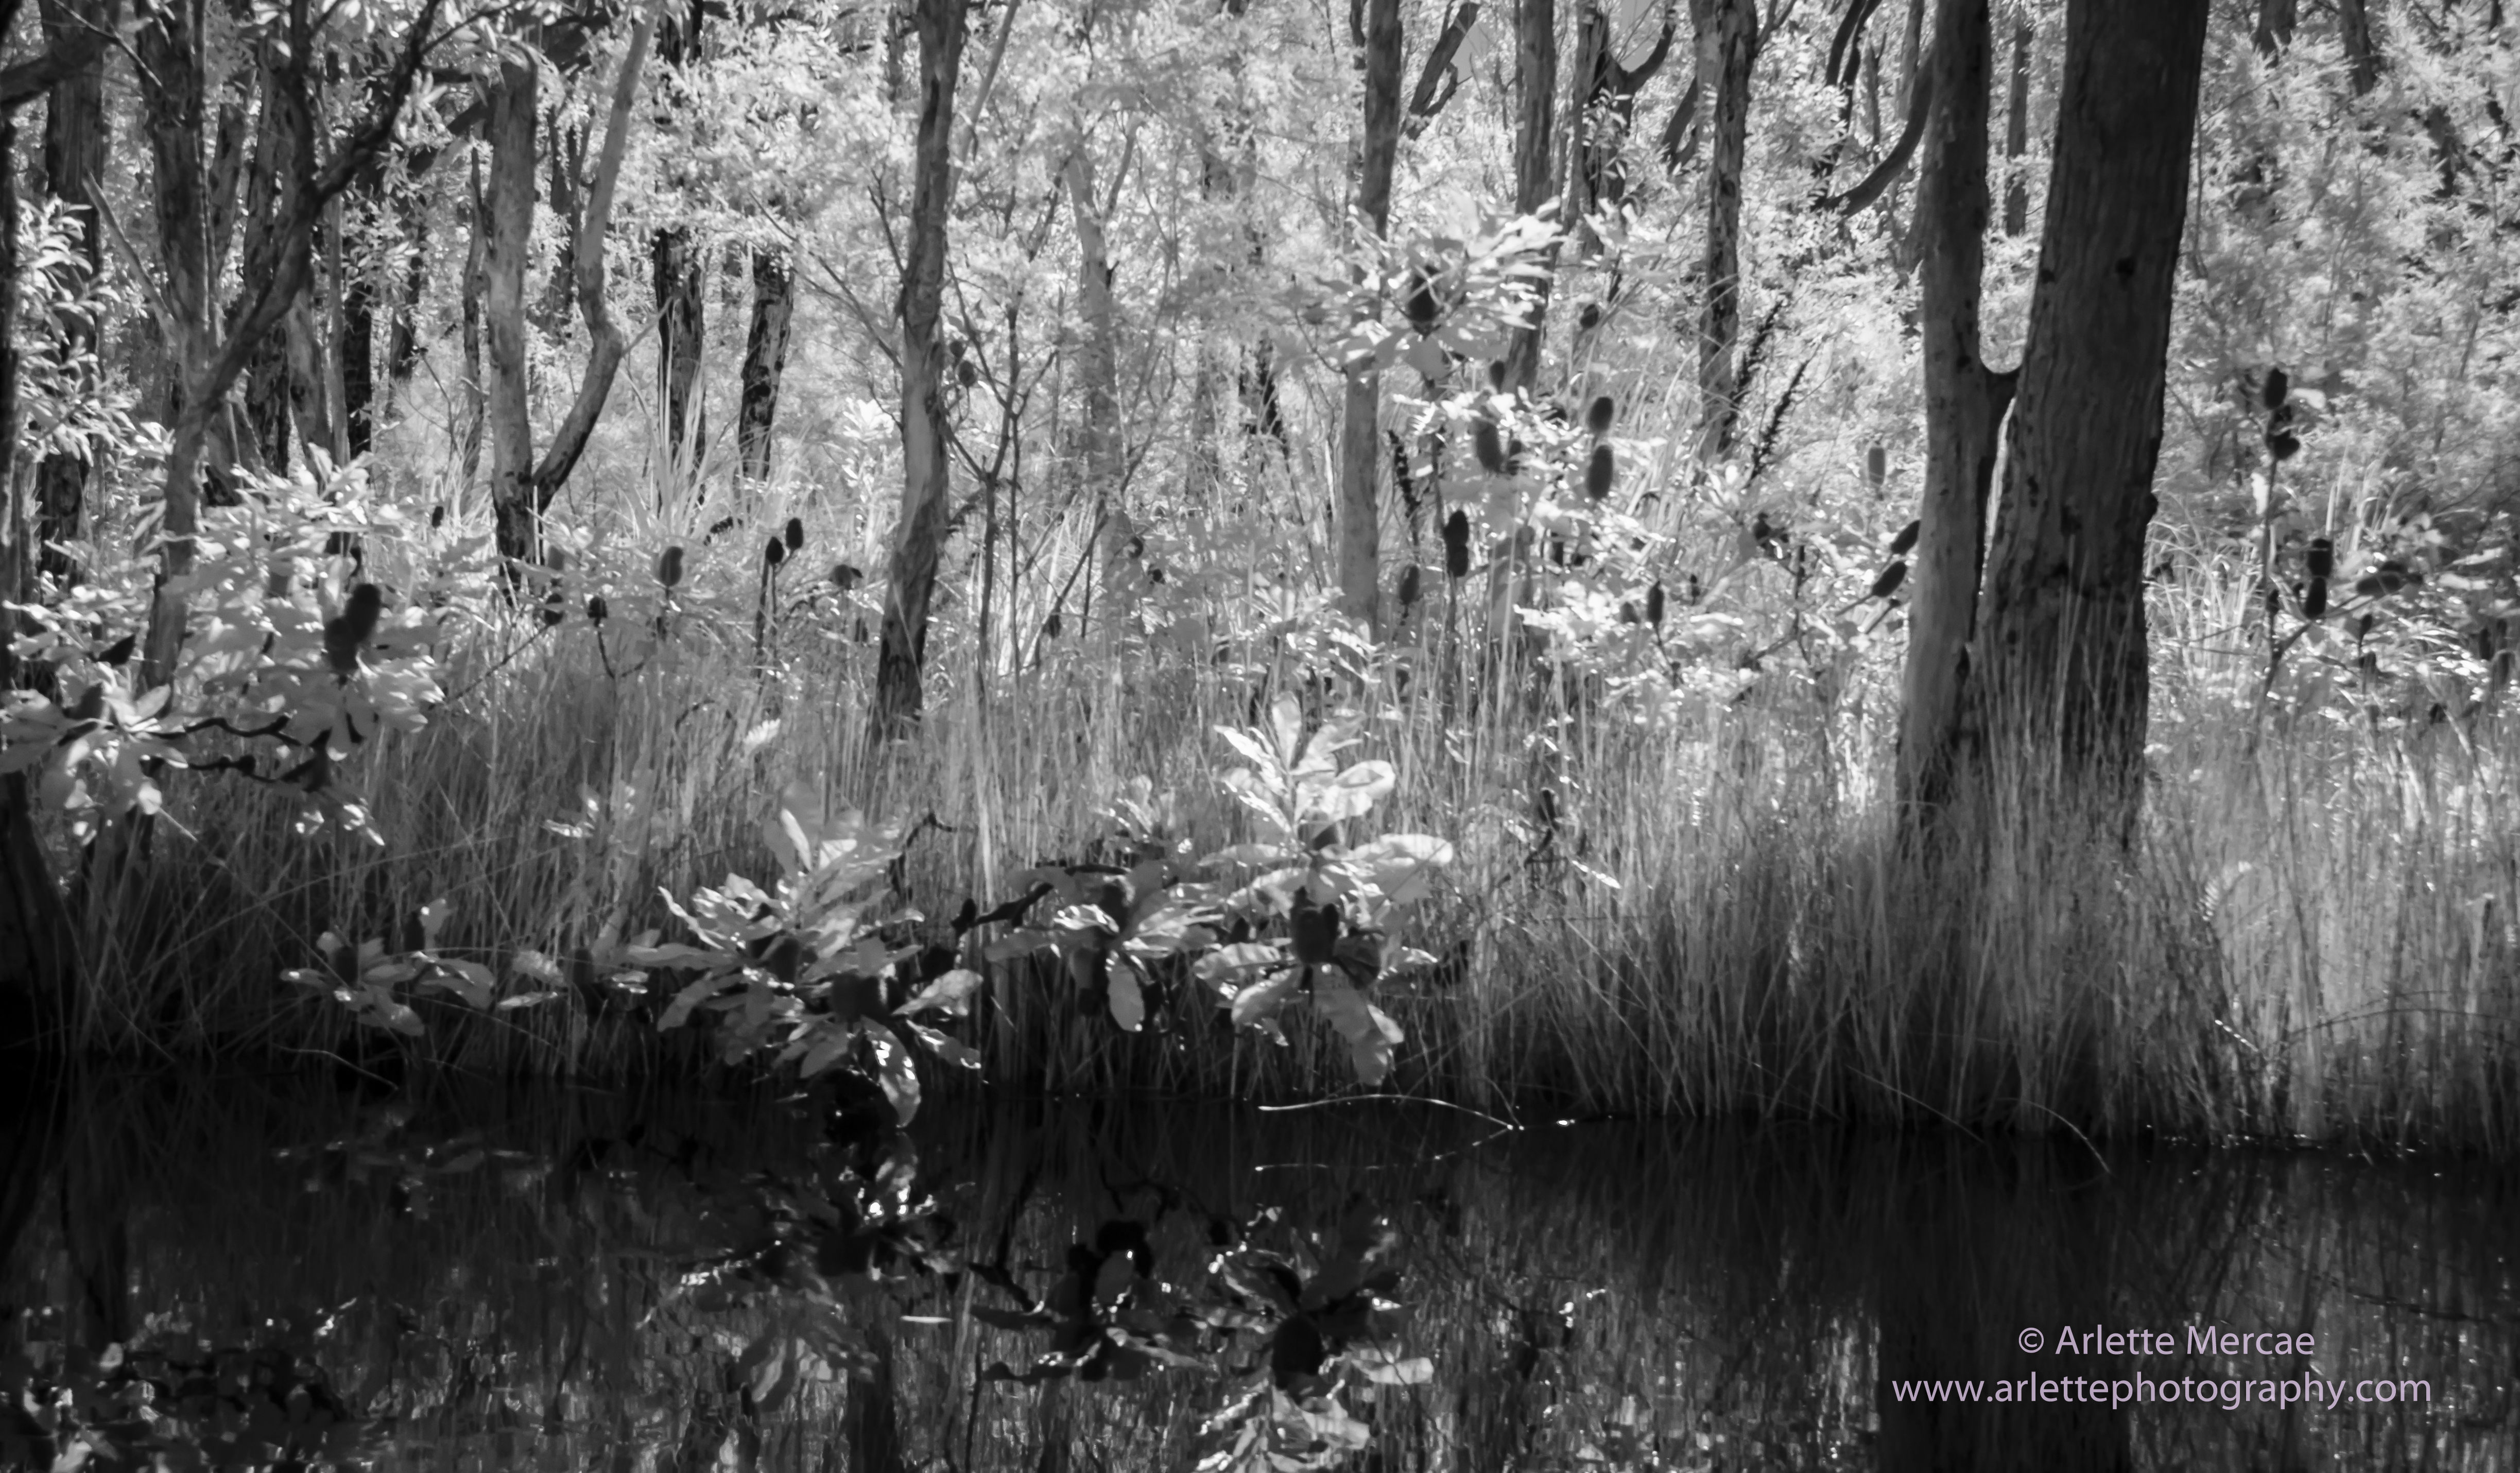 Noosa Everglades - 13